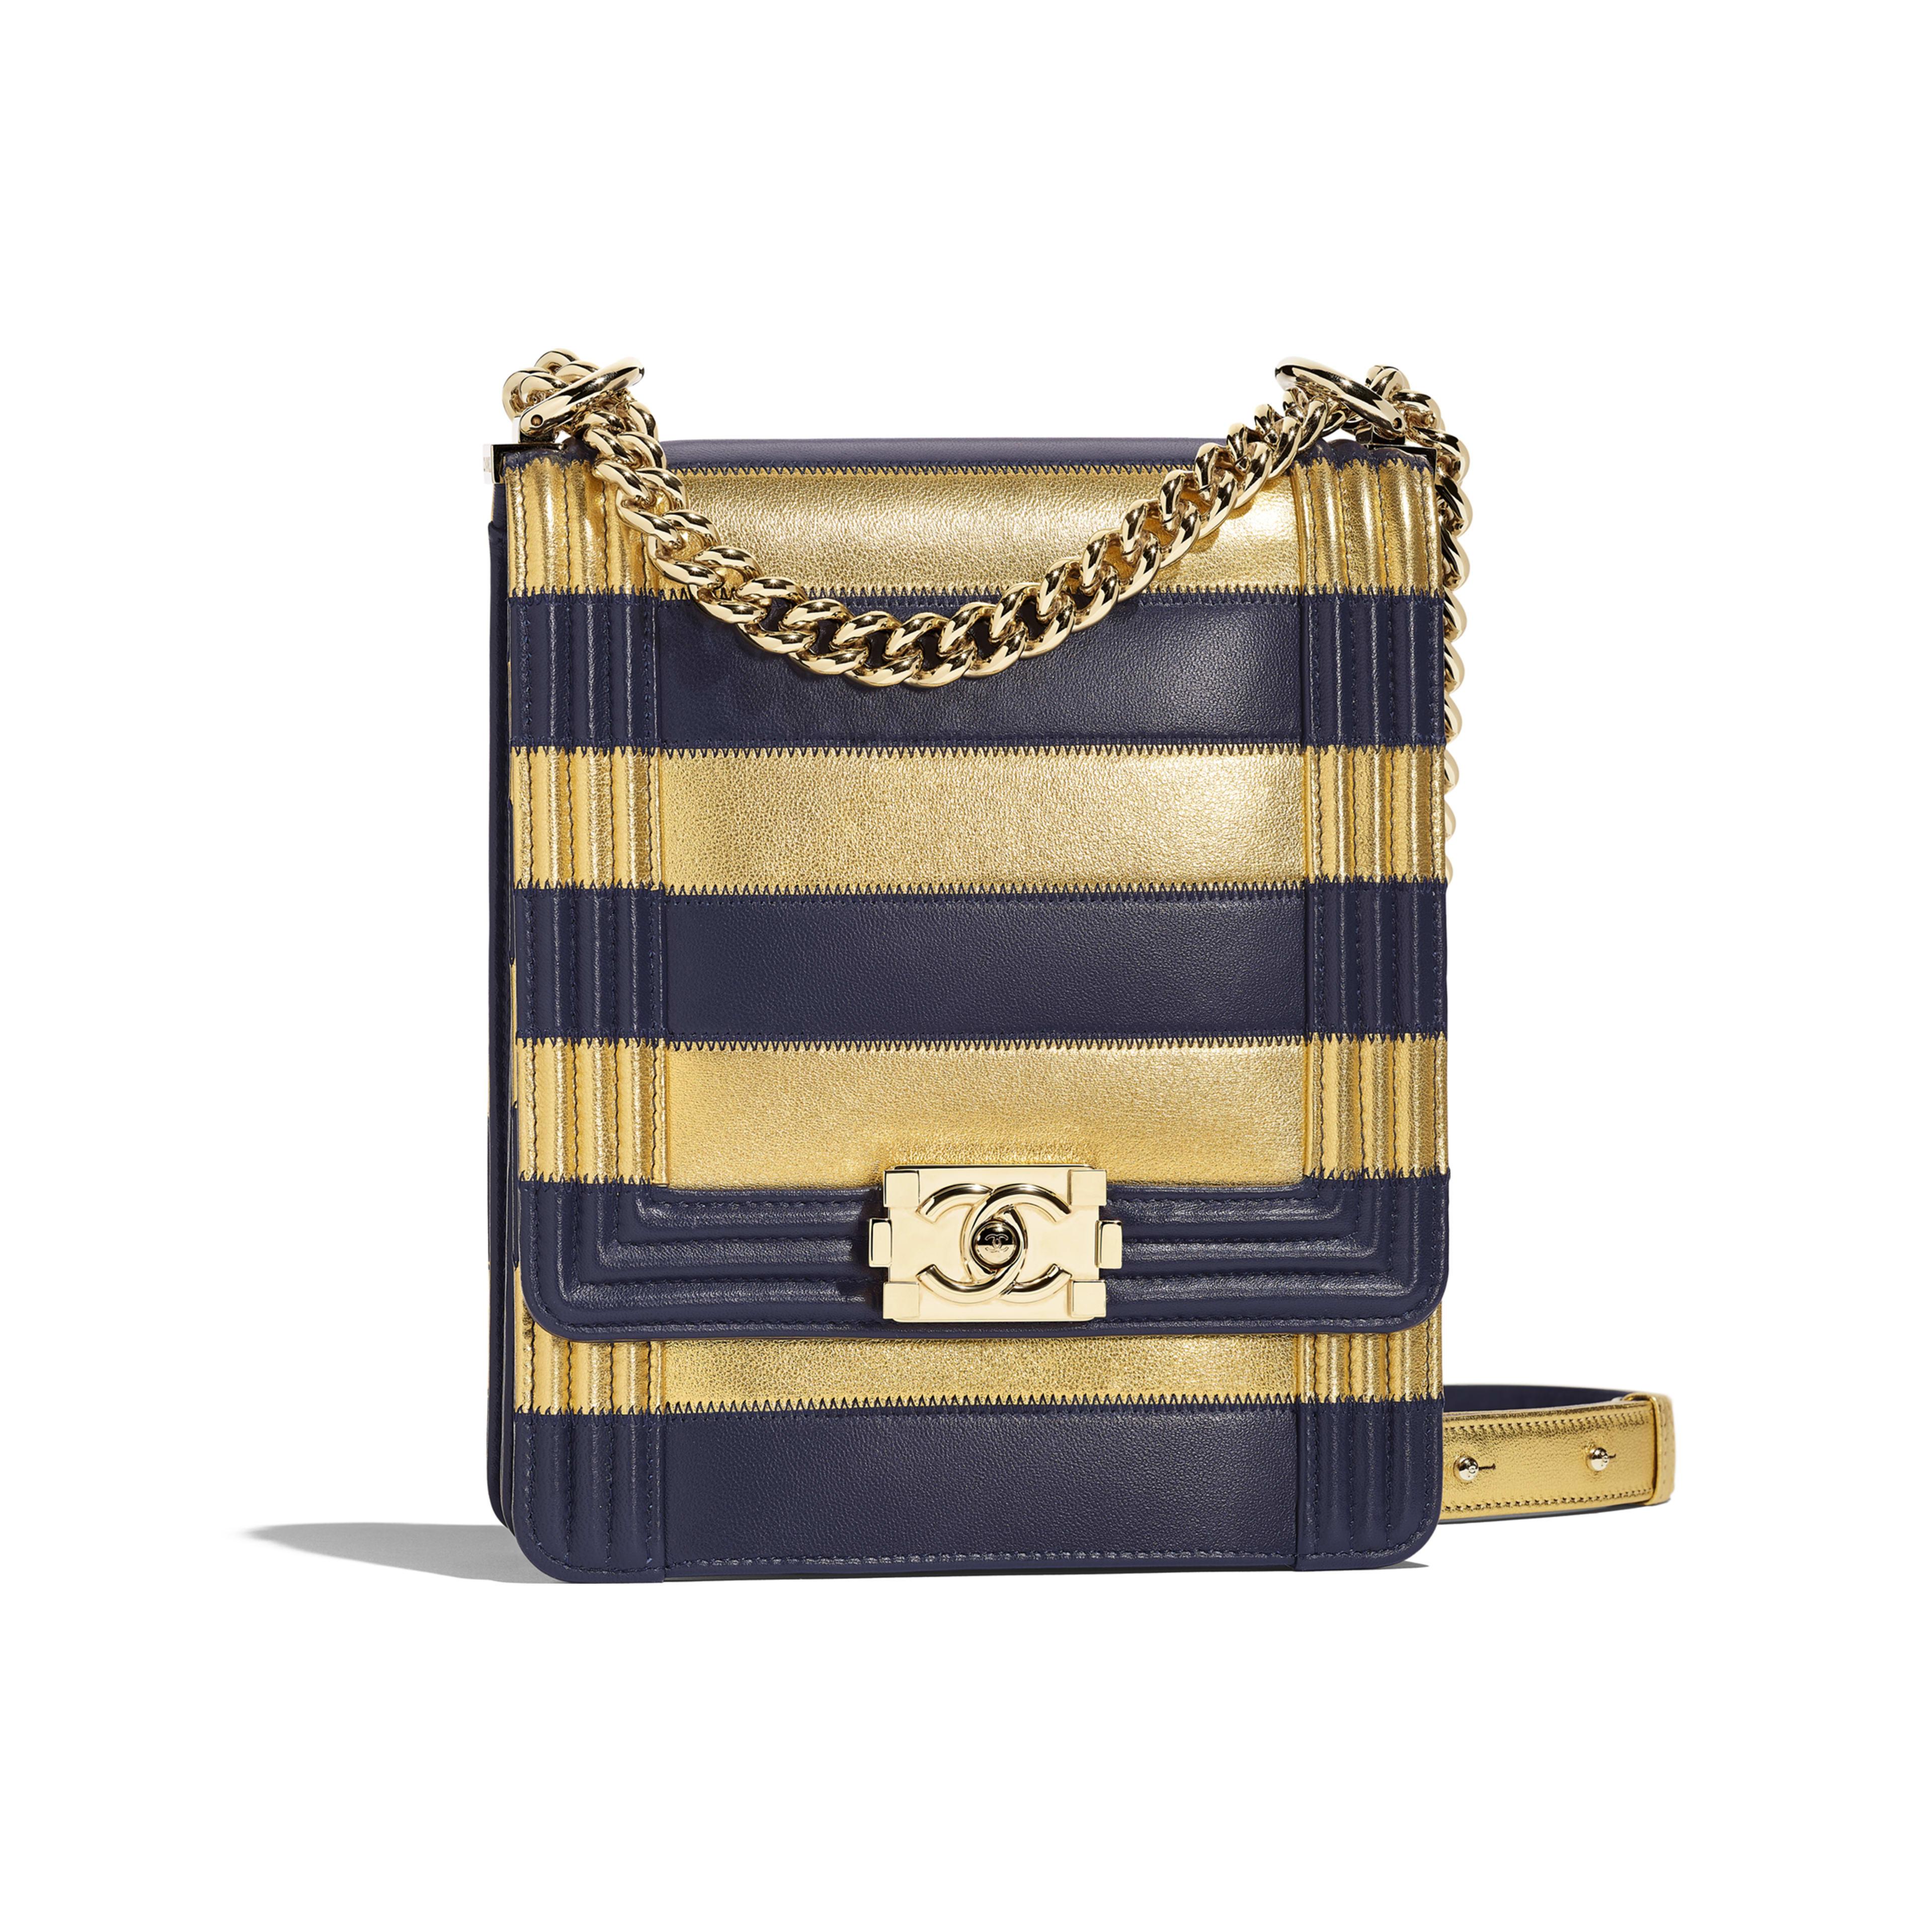 BOY CHANEL Handbag - Gold & Navy Blue - Lambskin, Calfskin & Gold-Tone Metal - Default view - see full sized version